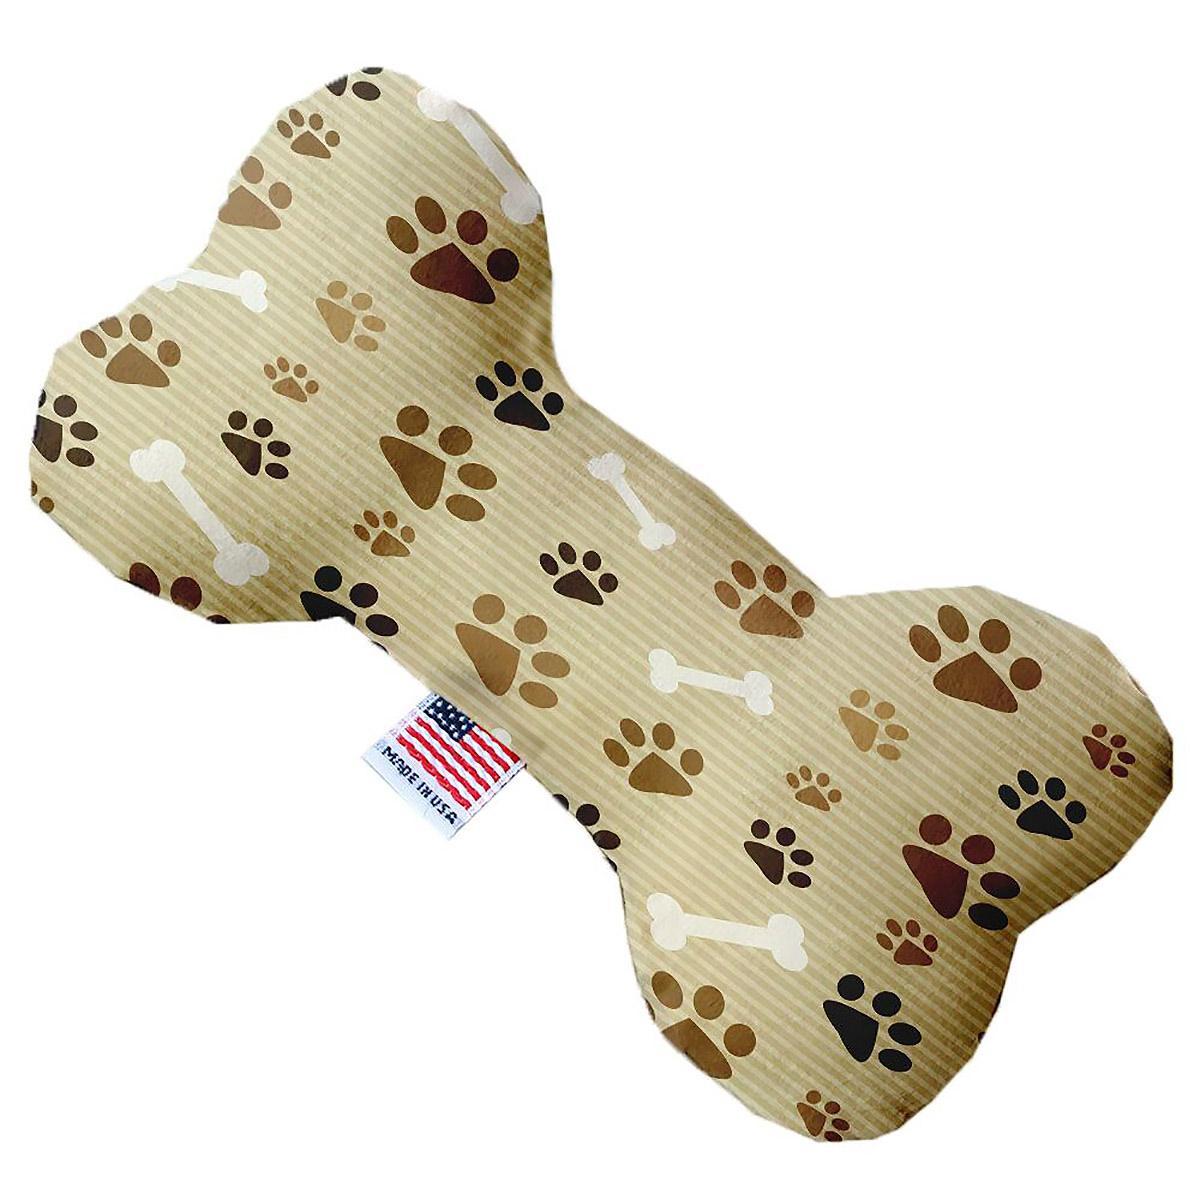 Bone Dog Toy - Mocha Paws and Bones